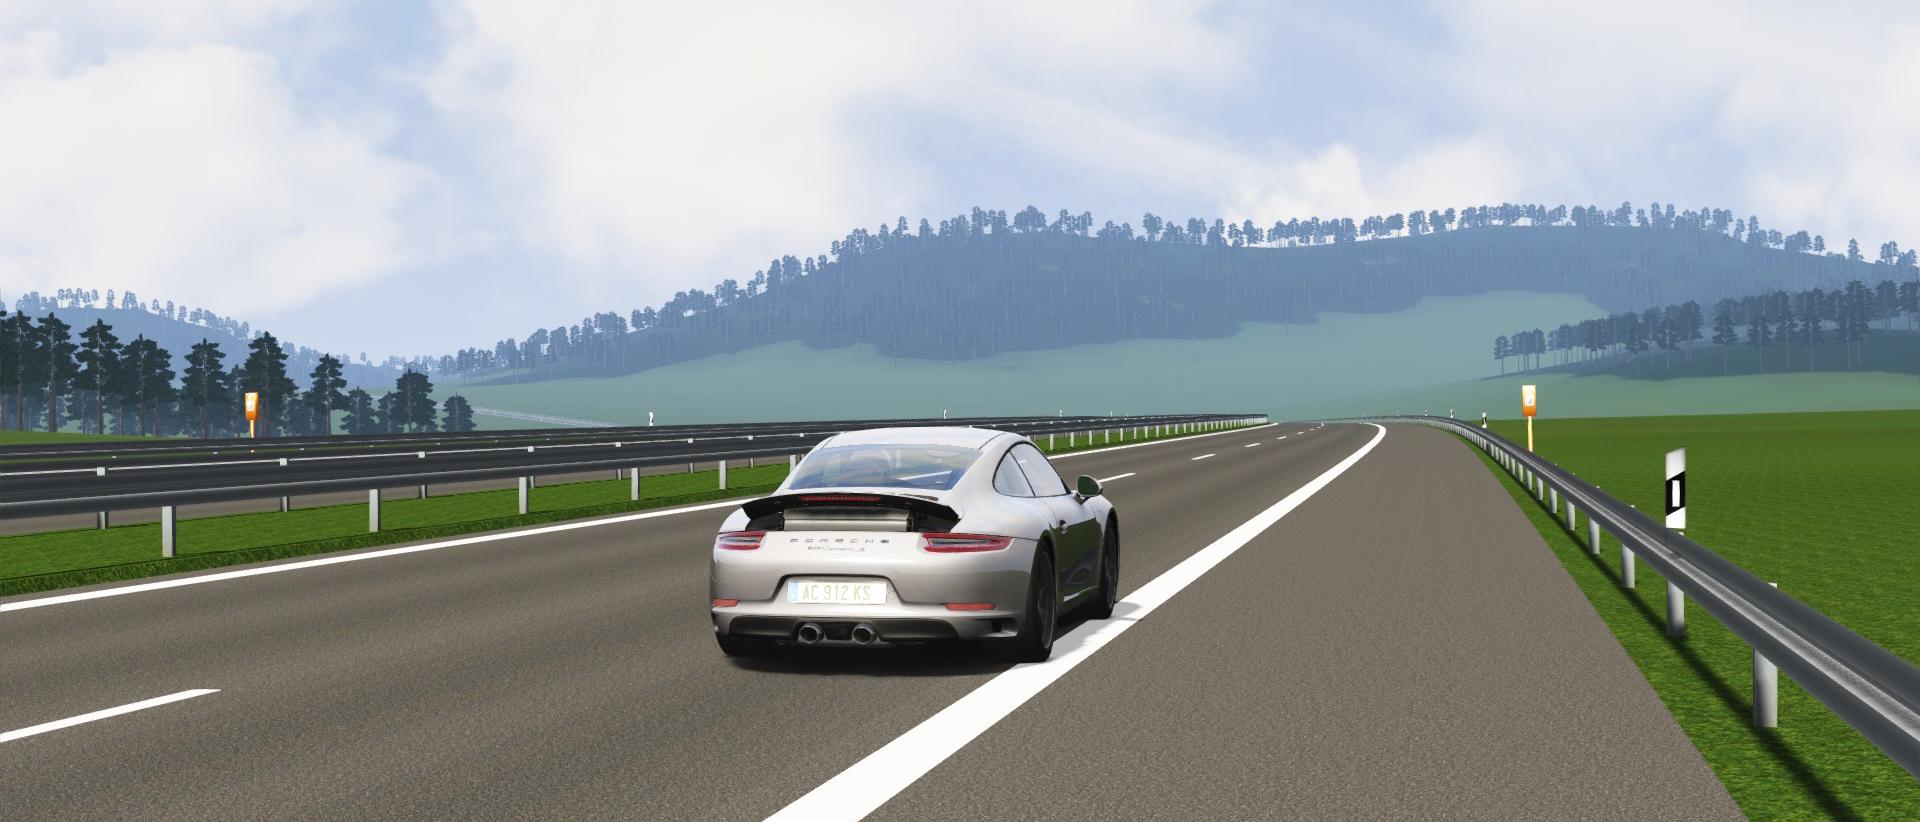 Screenshot_ks_porsche_991_carrera_s_Autobahn_3-12-116-0-2-20.jpg